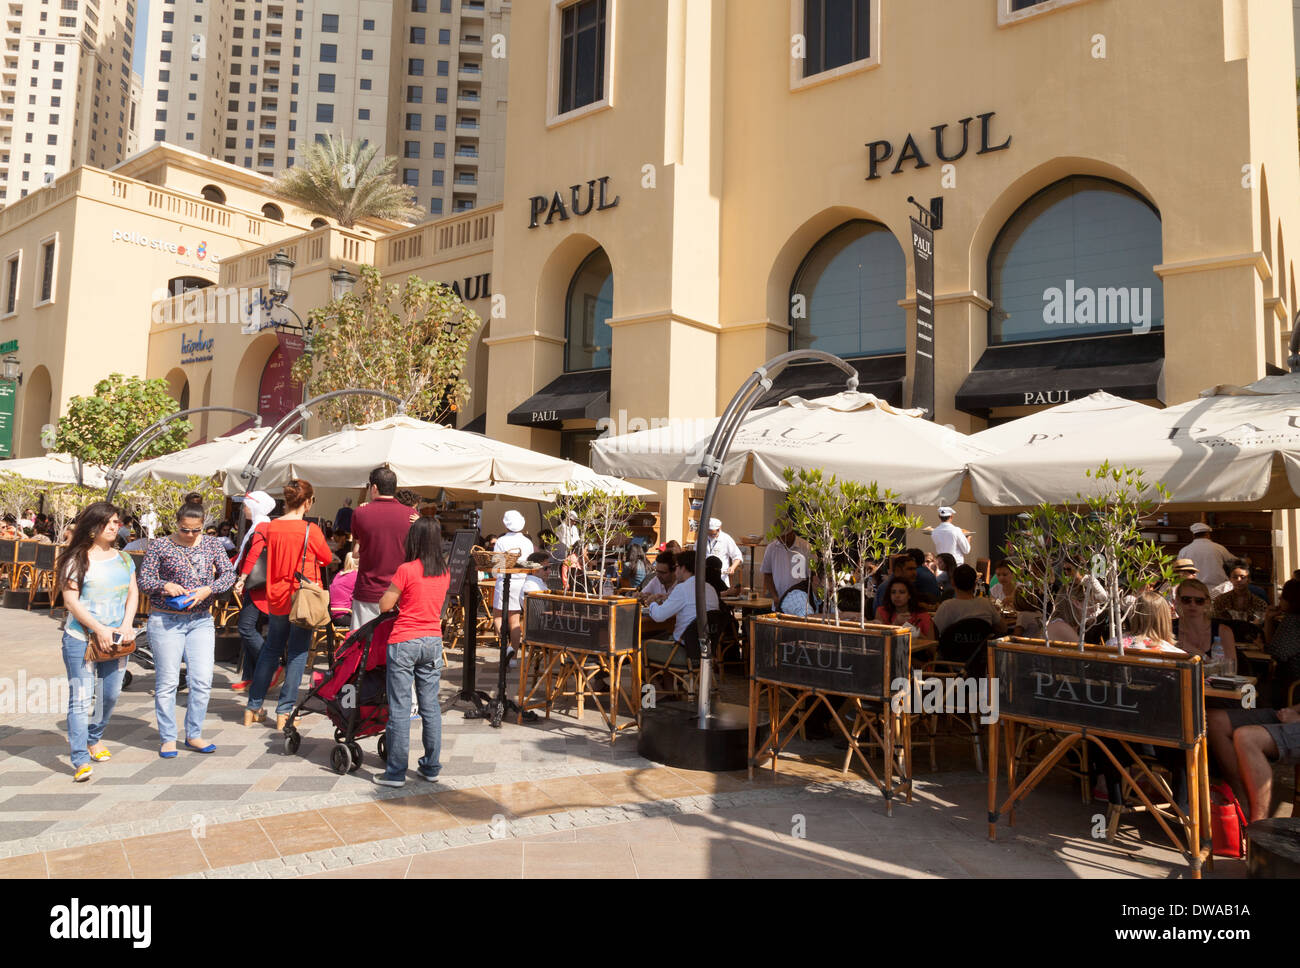 Paul Restaurant Exterior The Walk Jumeirah Beach Residences Jbr Dubai Uae United Arab Emirates Middle East